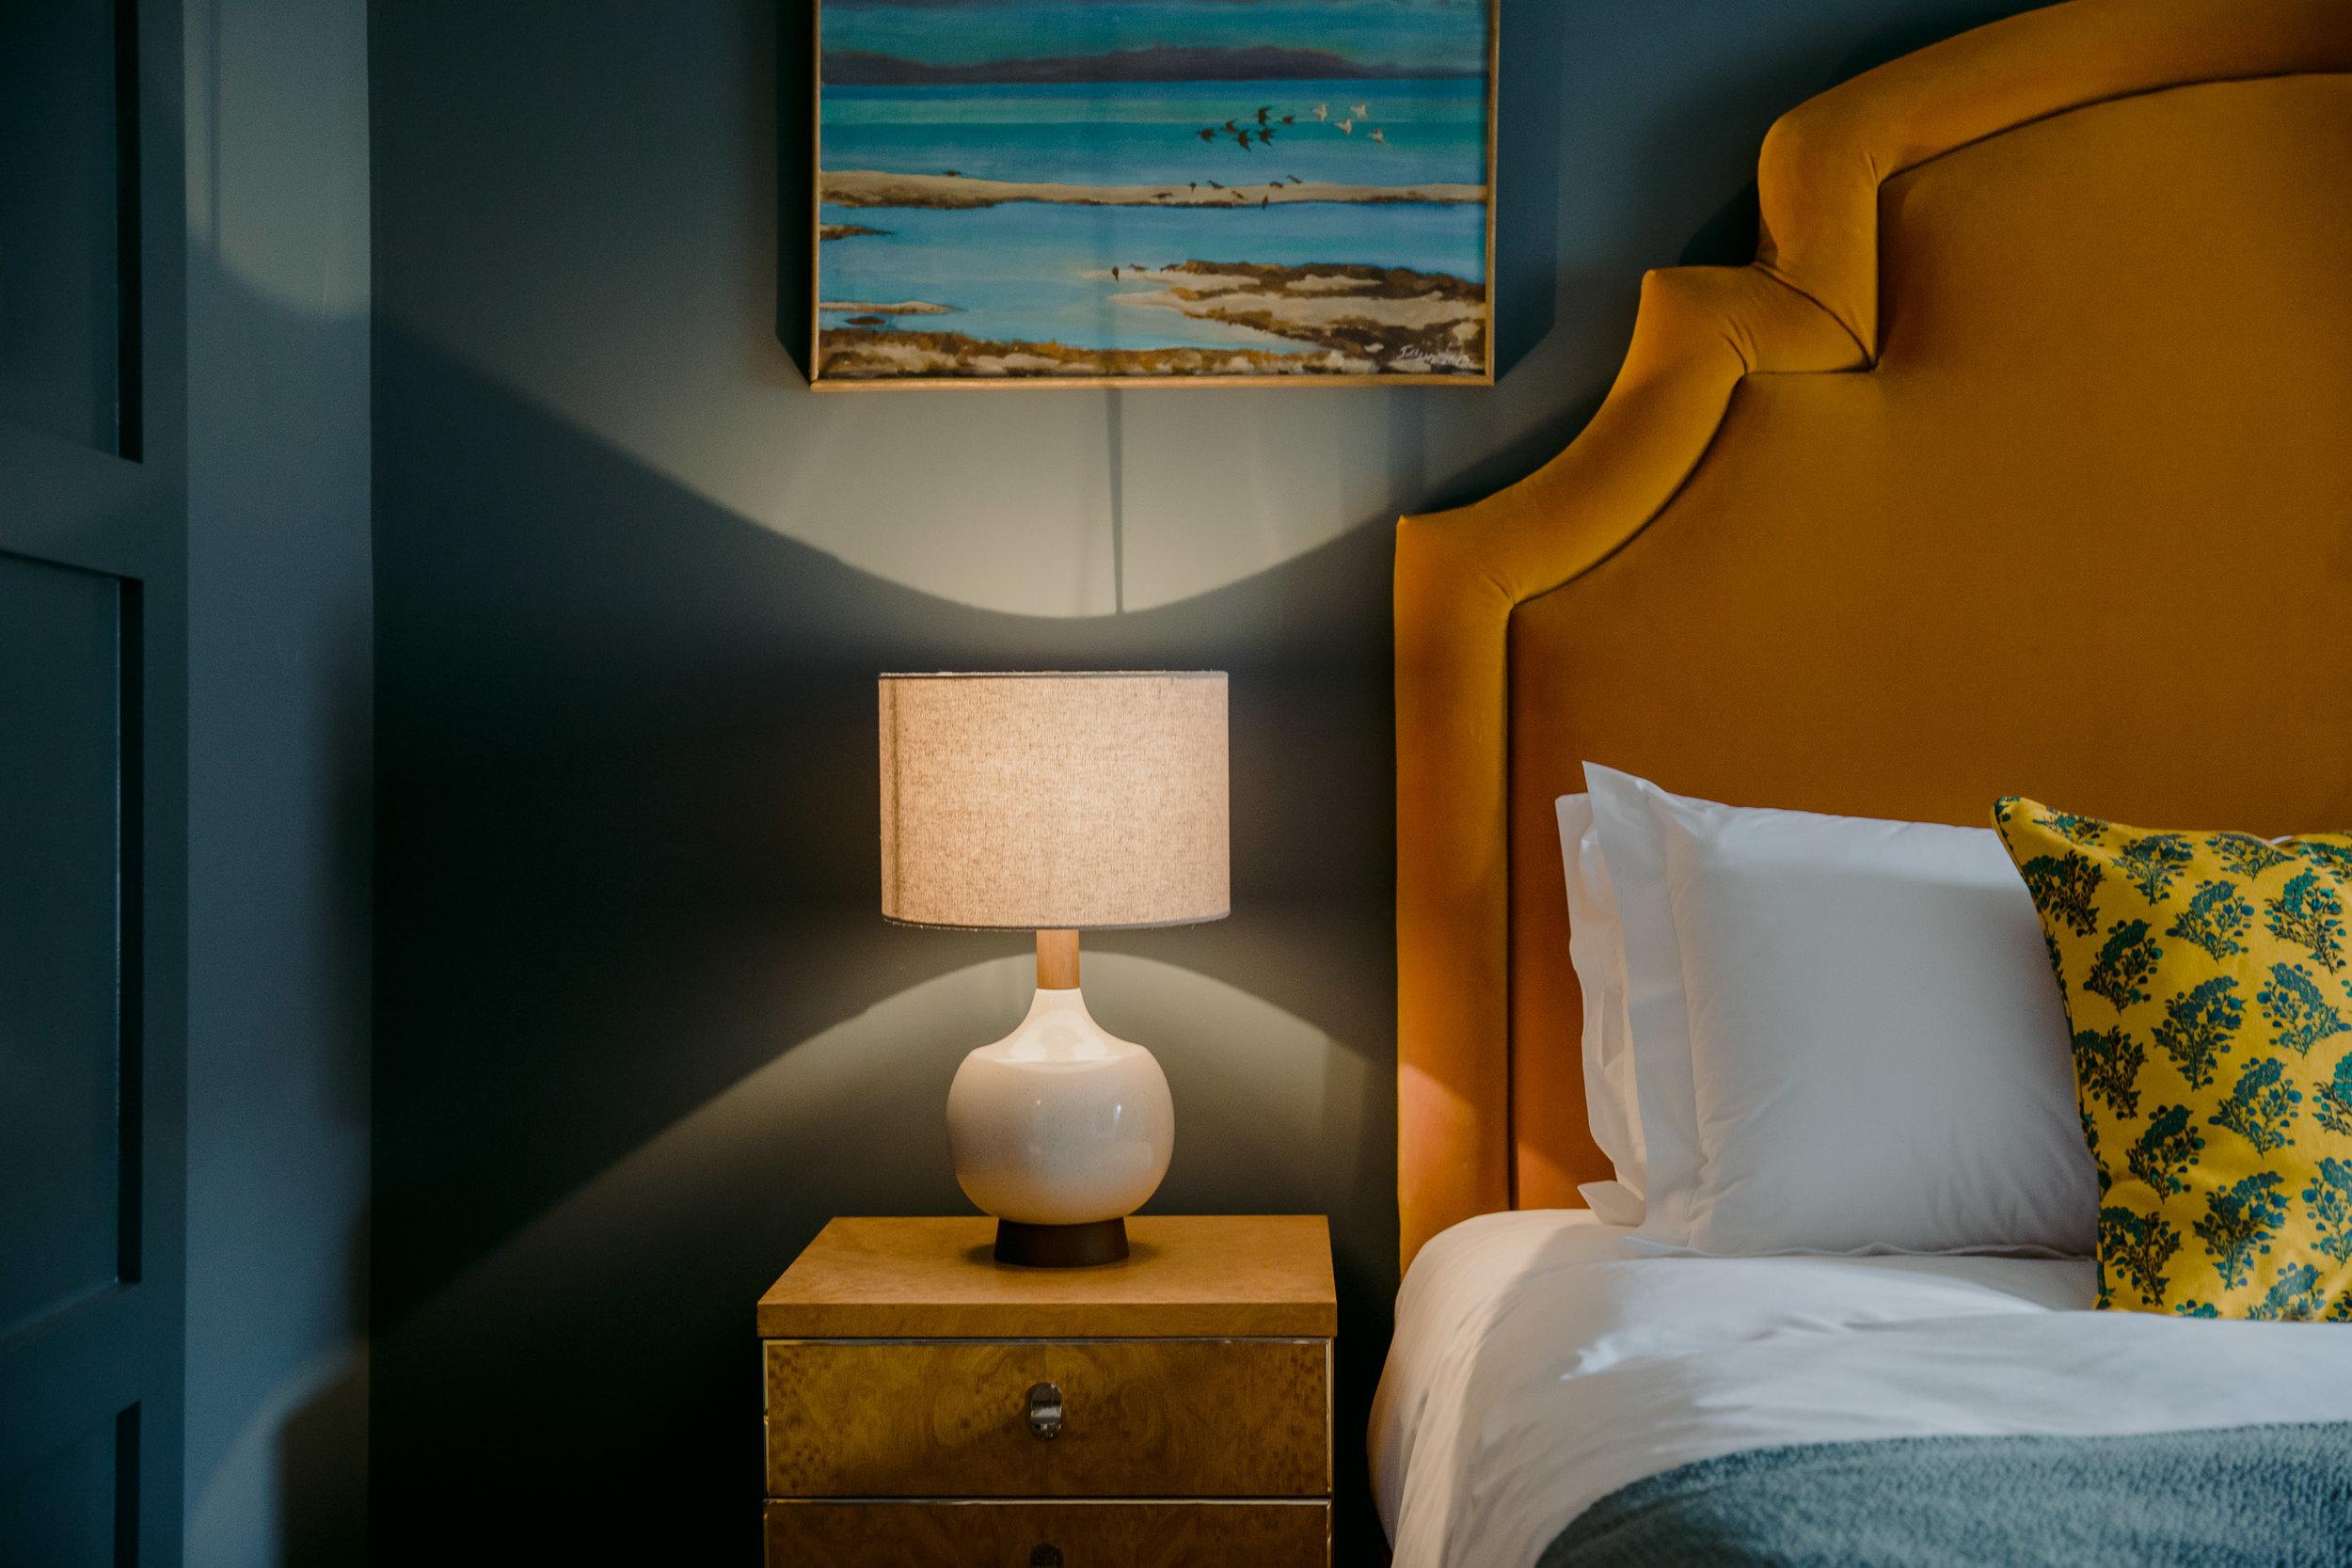 deal-hotel-the-rose-kent-coast-interior-design-support-local-magazine-styling-refurb-1-60777.jpg